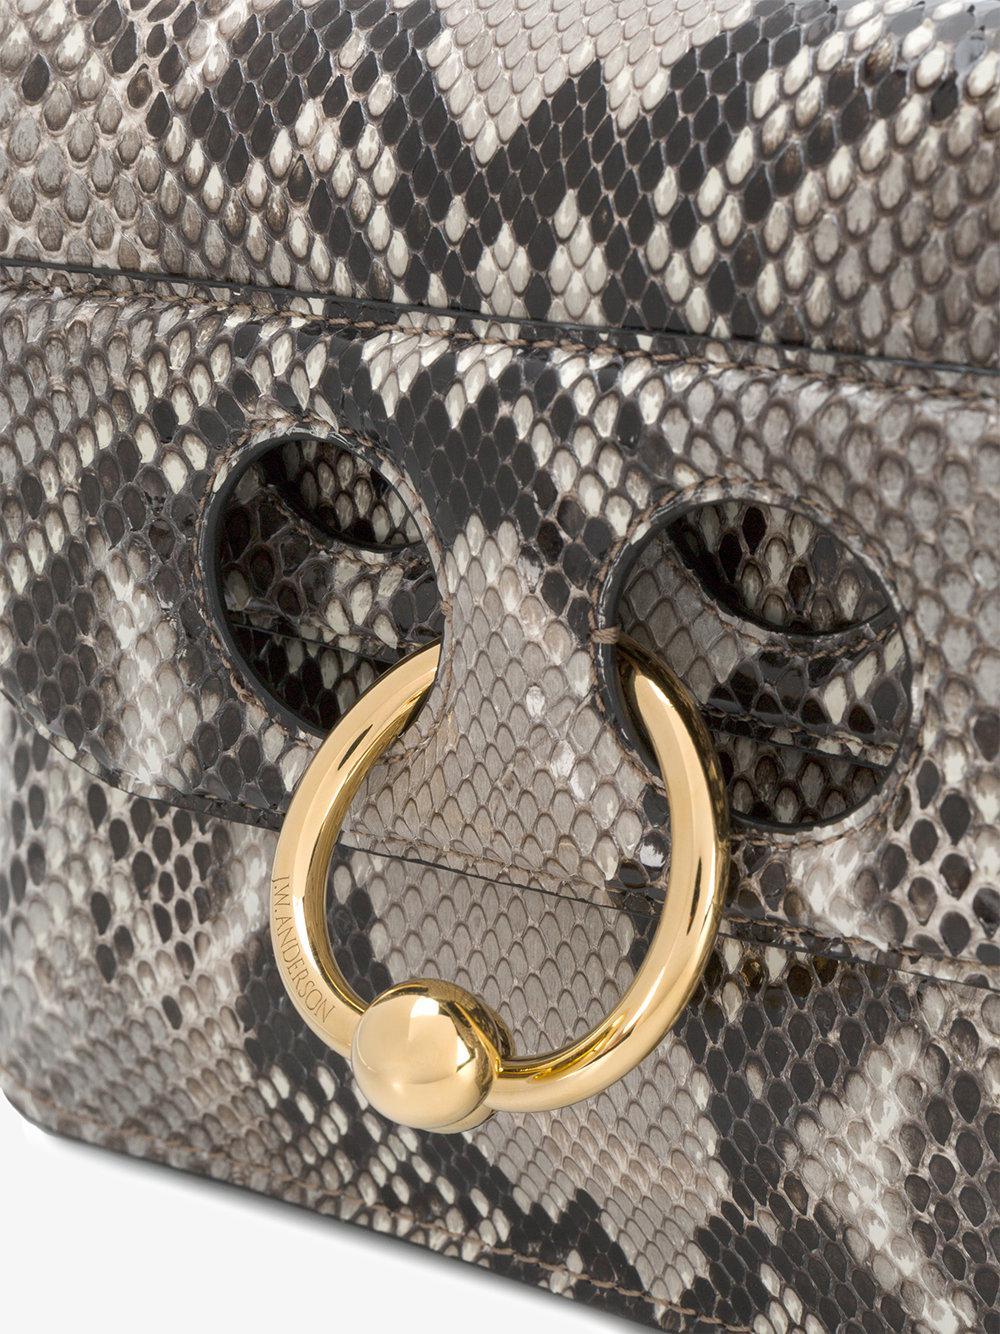 JW Anderson Mini Python Pierce Crossbody Bag